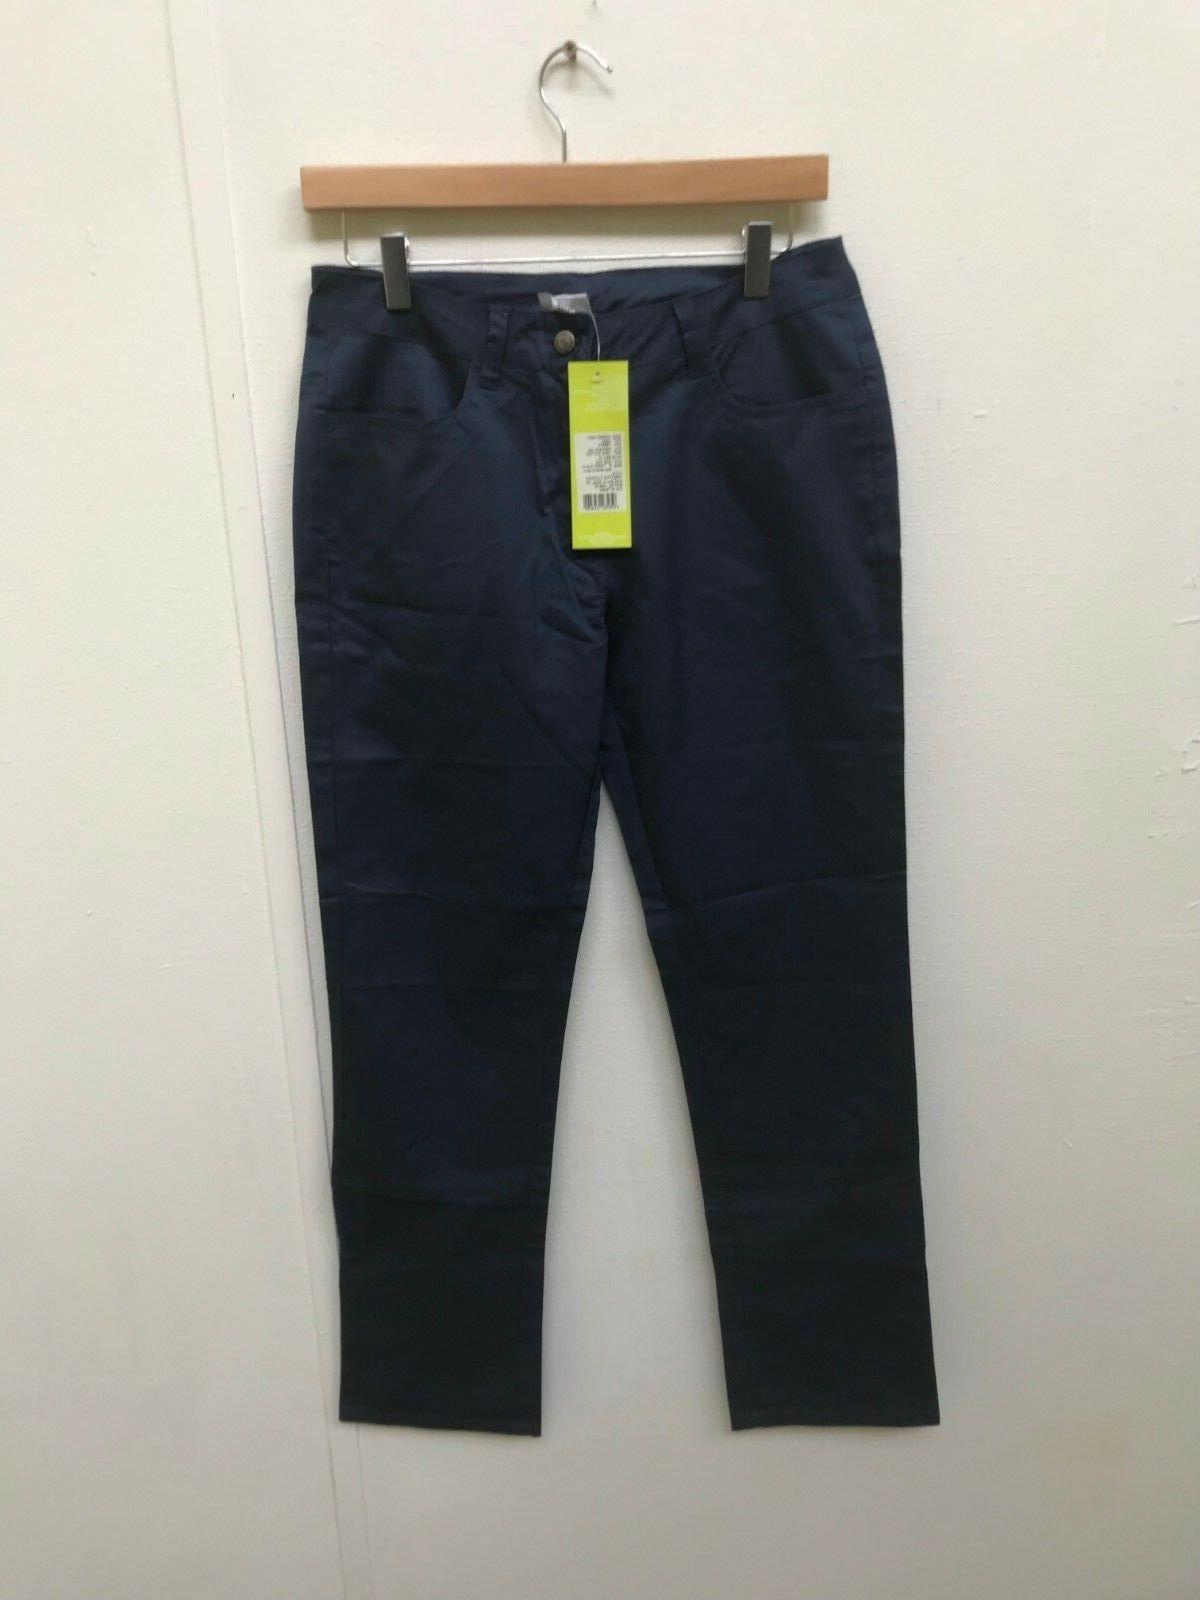 adidas NEO Women's Cargo Pants - Medium - Navy - New